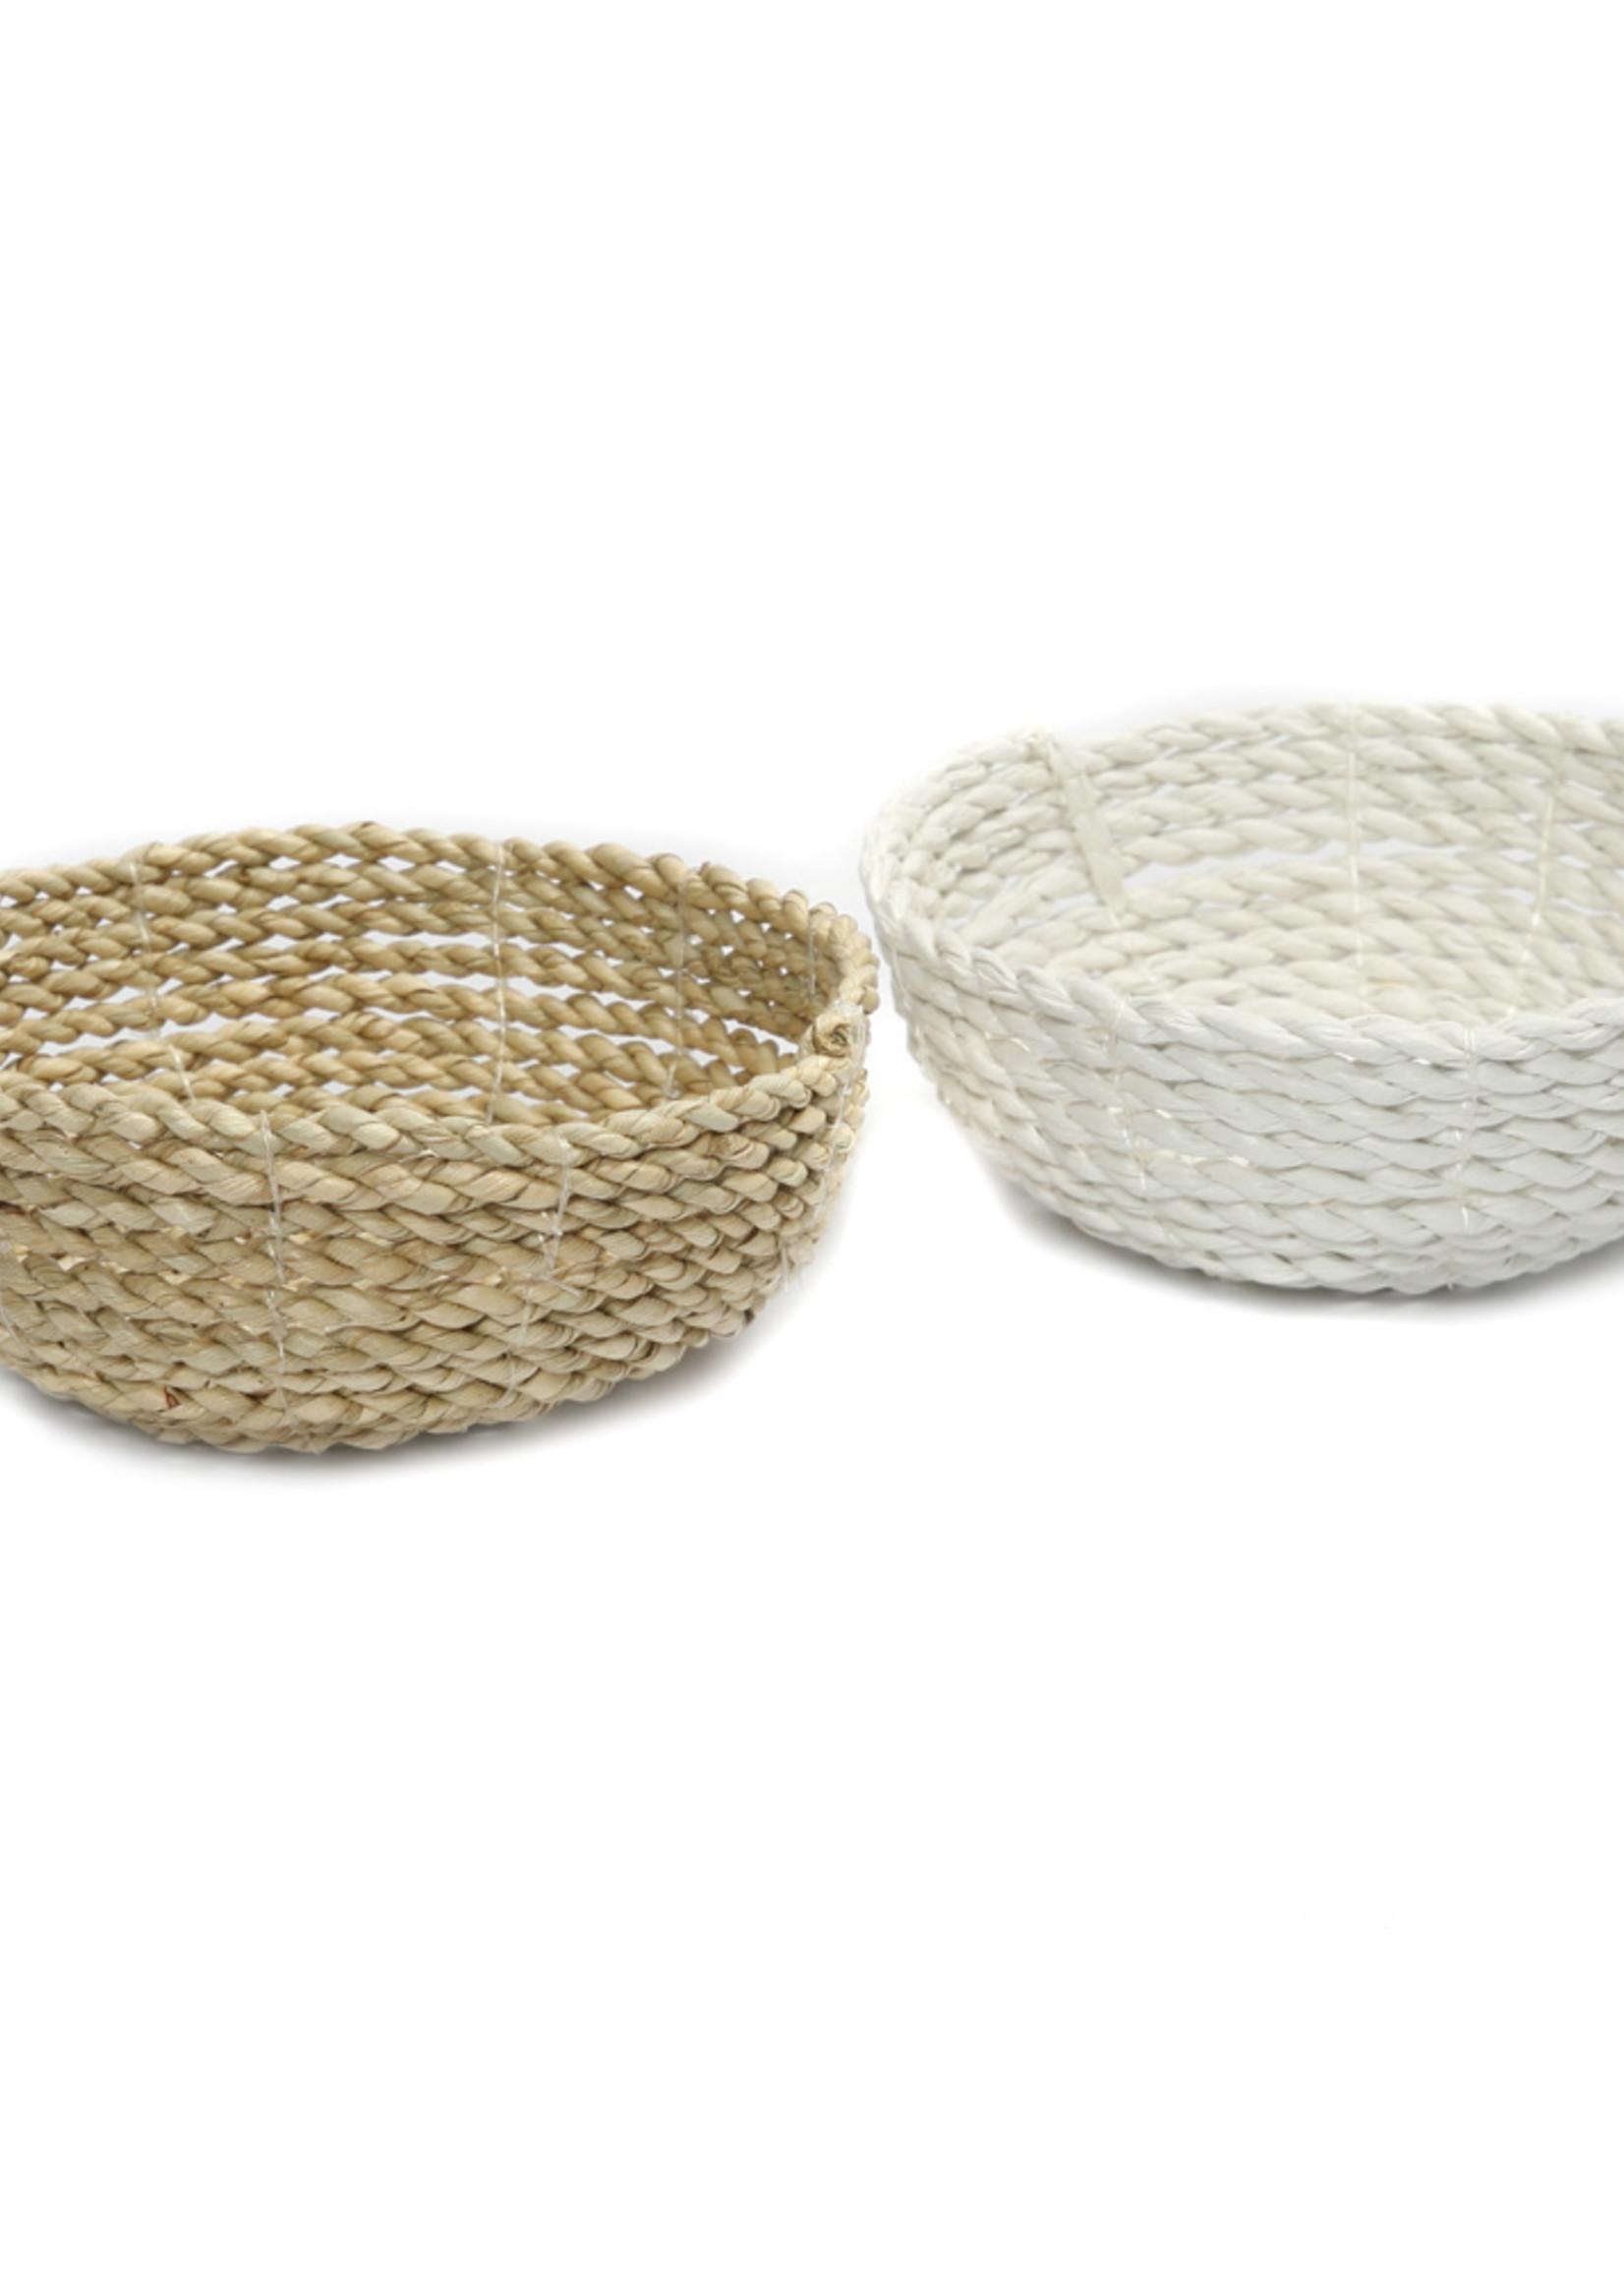 The Seagrass Bowl - White - S